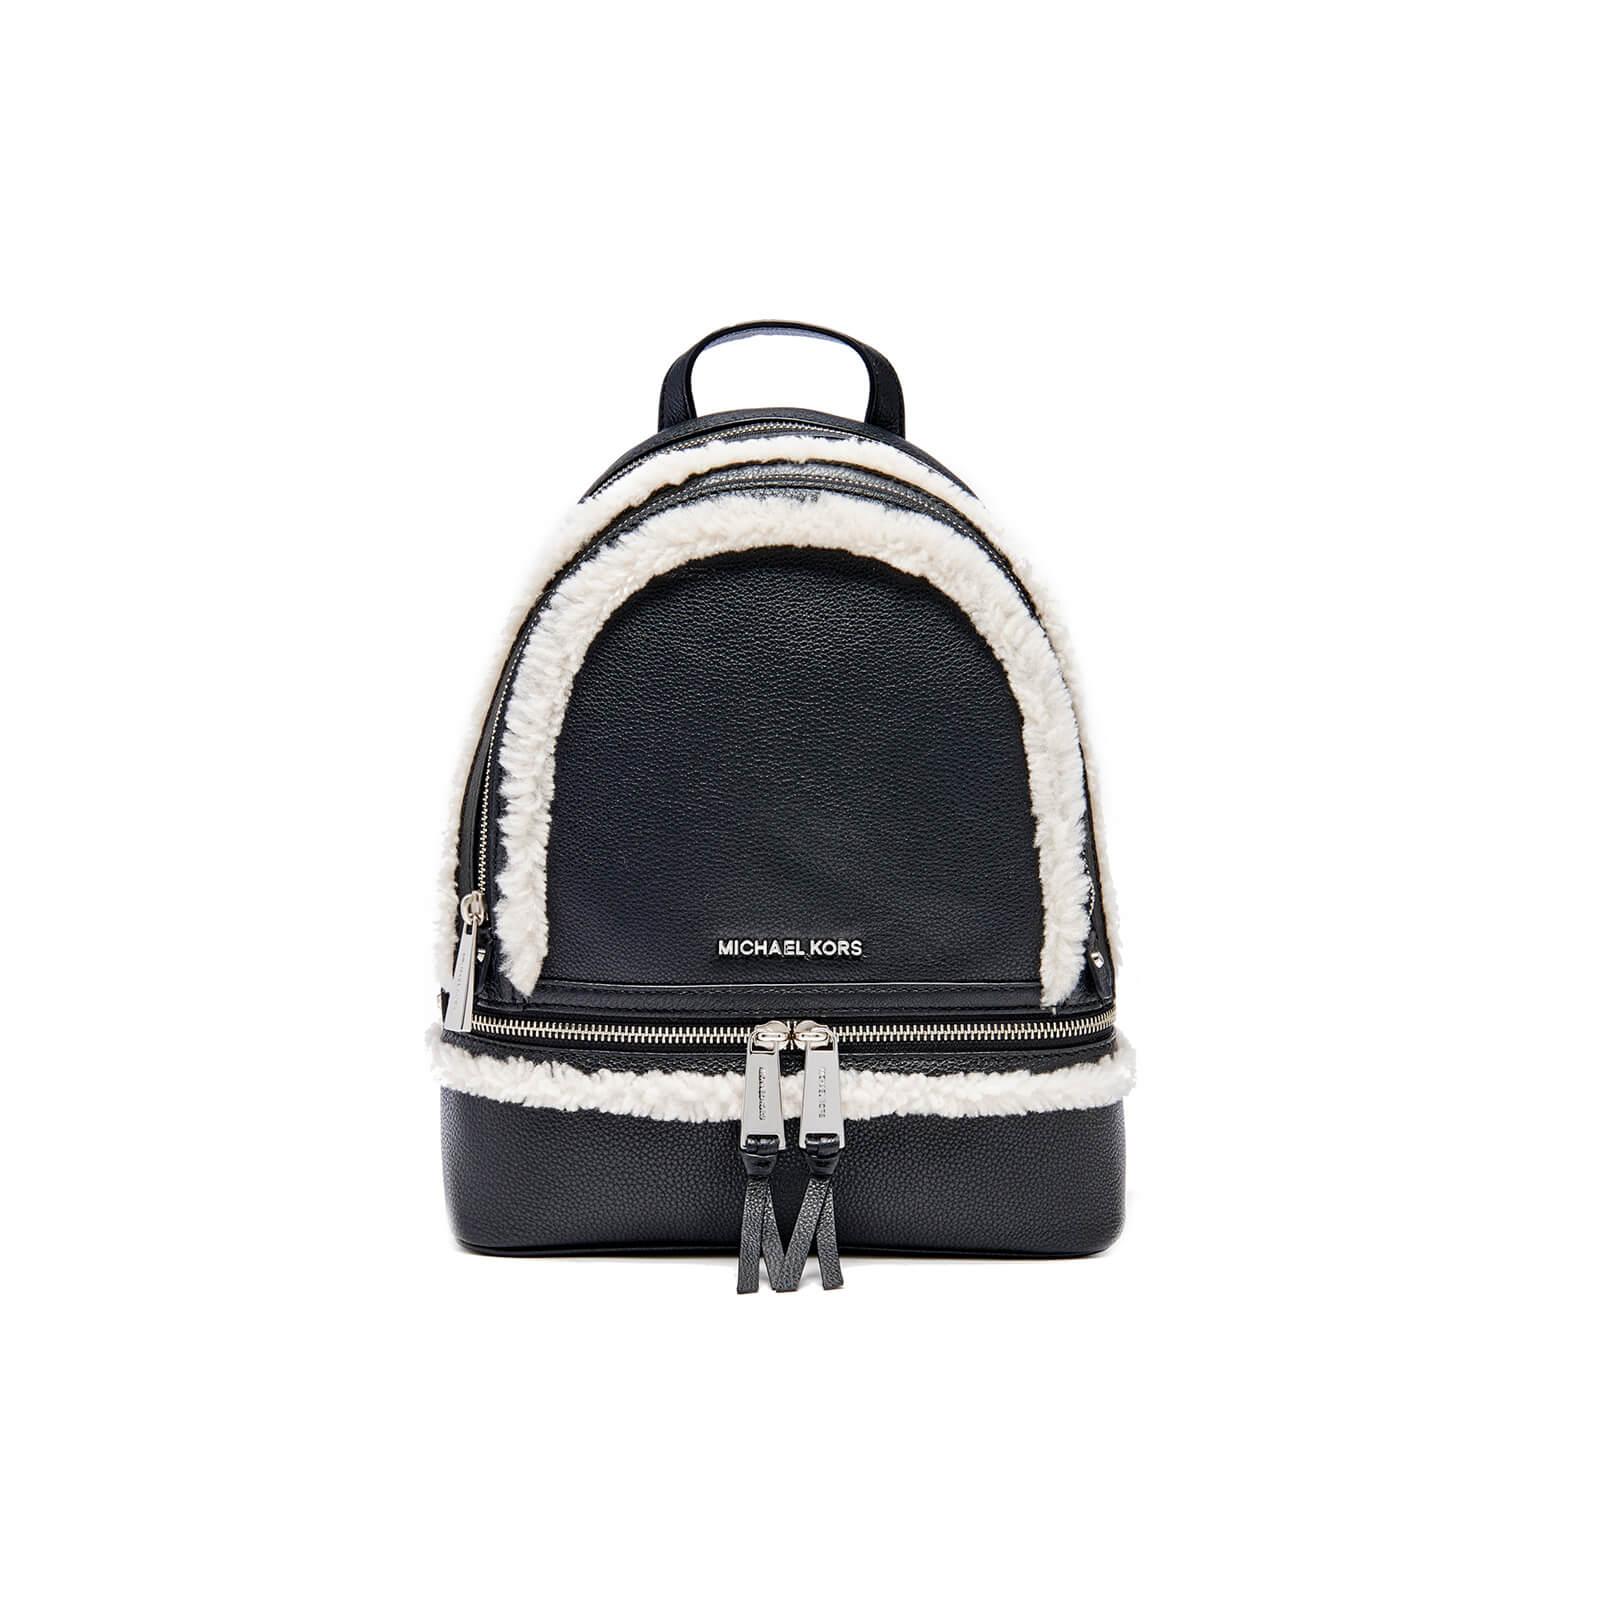 aaeb687a1c7e84 MICHAEL MICHAEL KORS Women's Rhea Zip Mid Shearling Trim Backpack - Black -  Free UK Delivery over £50